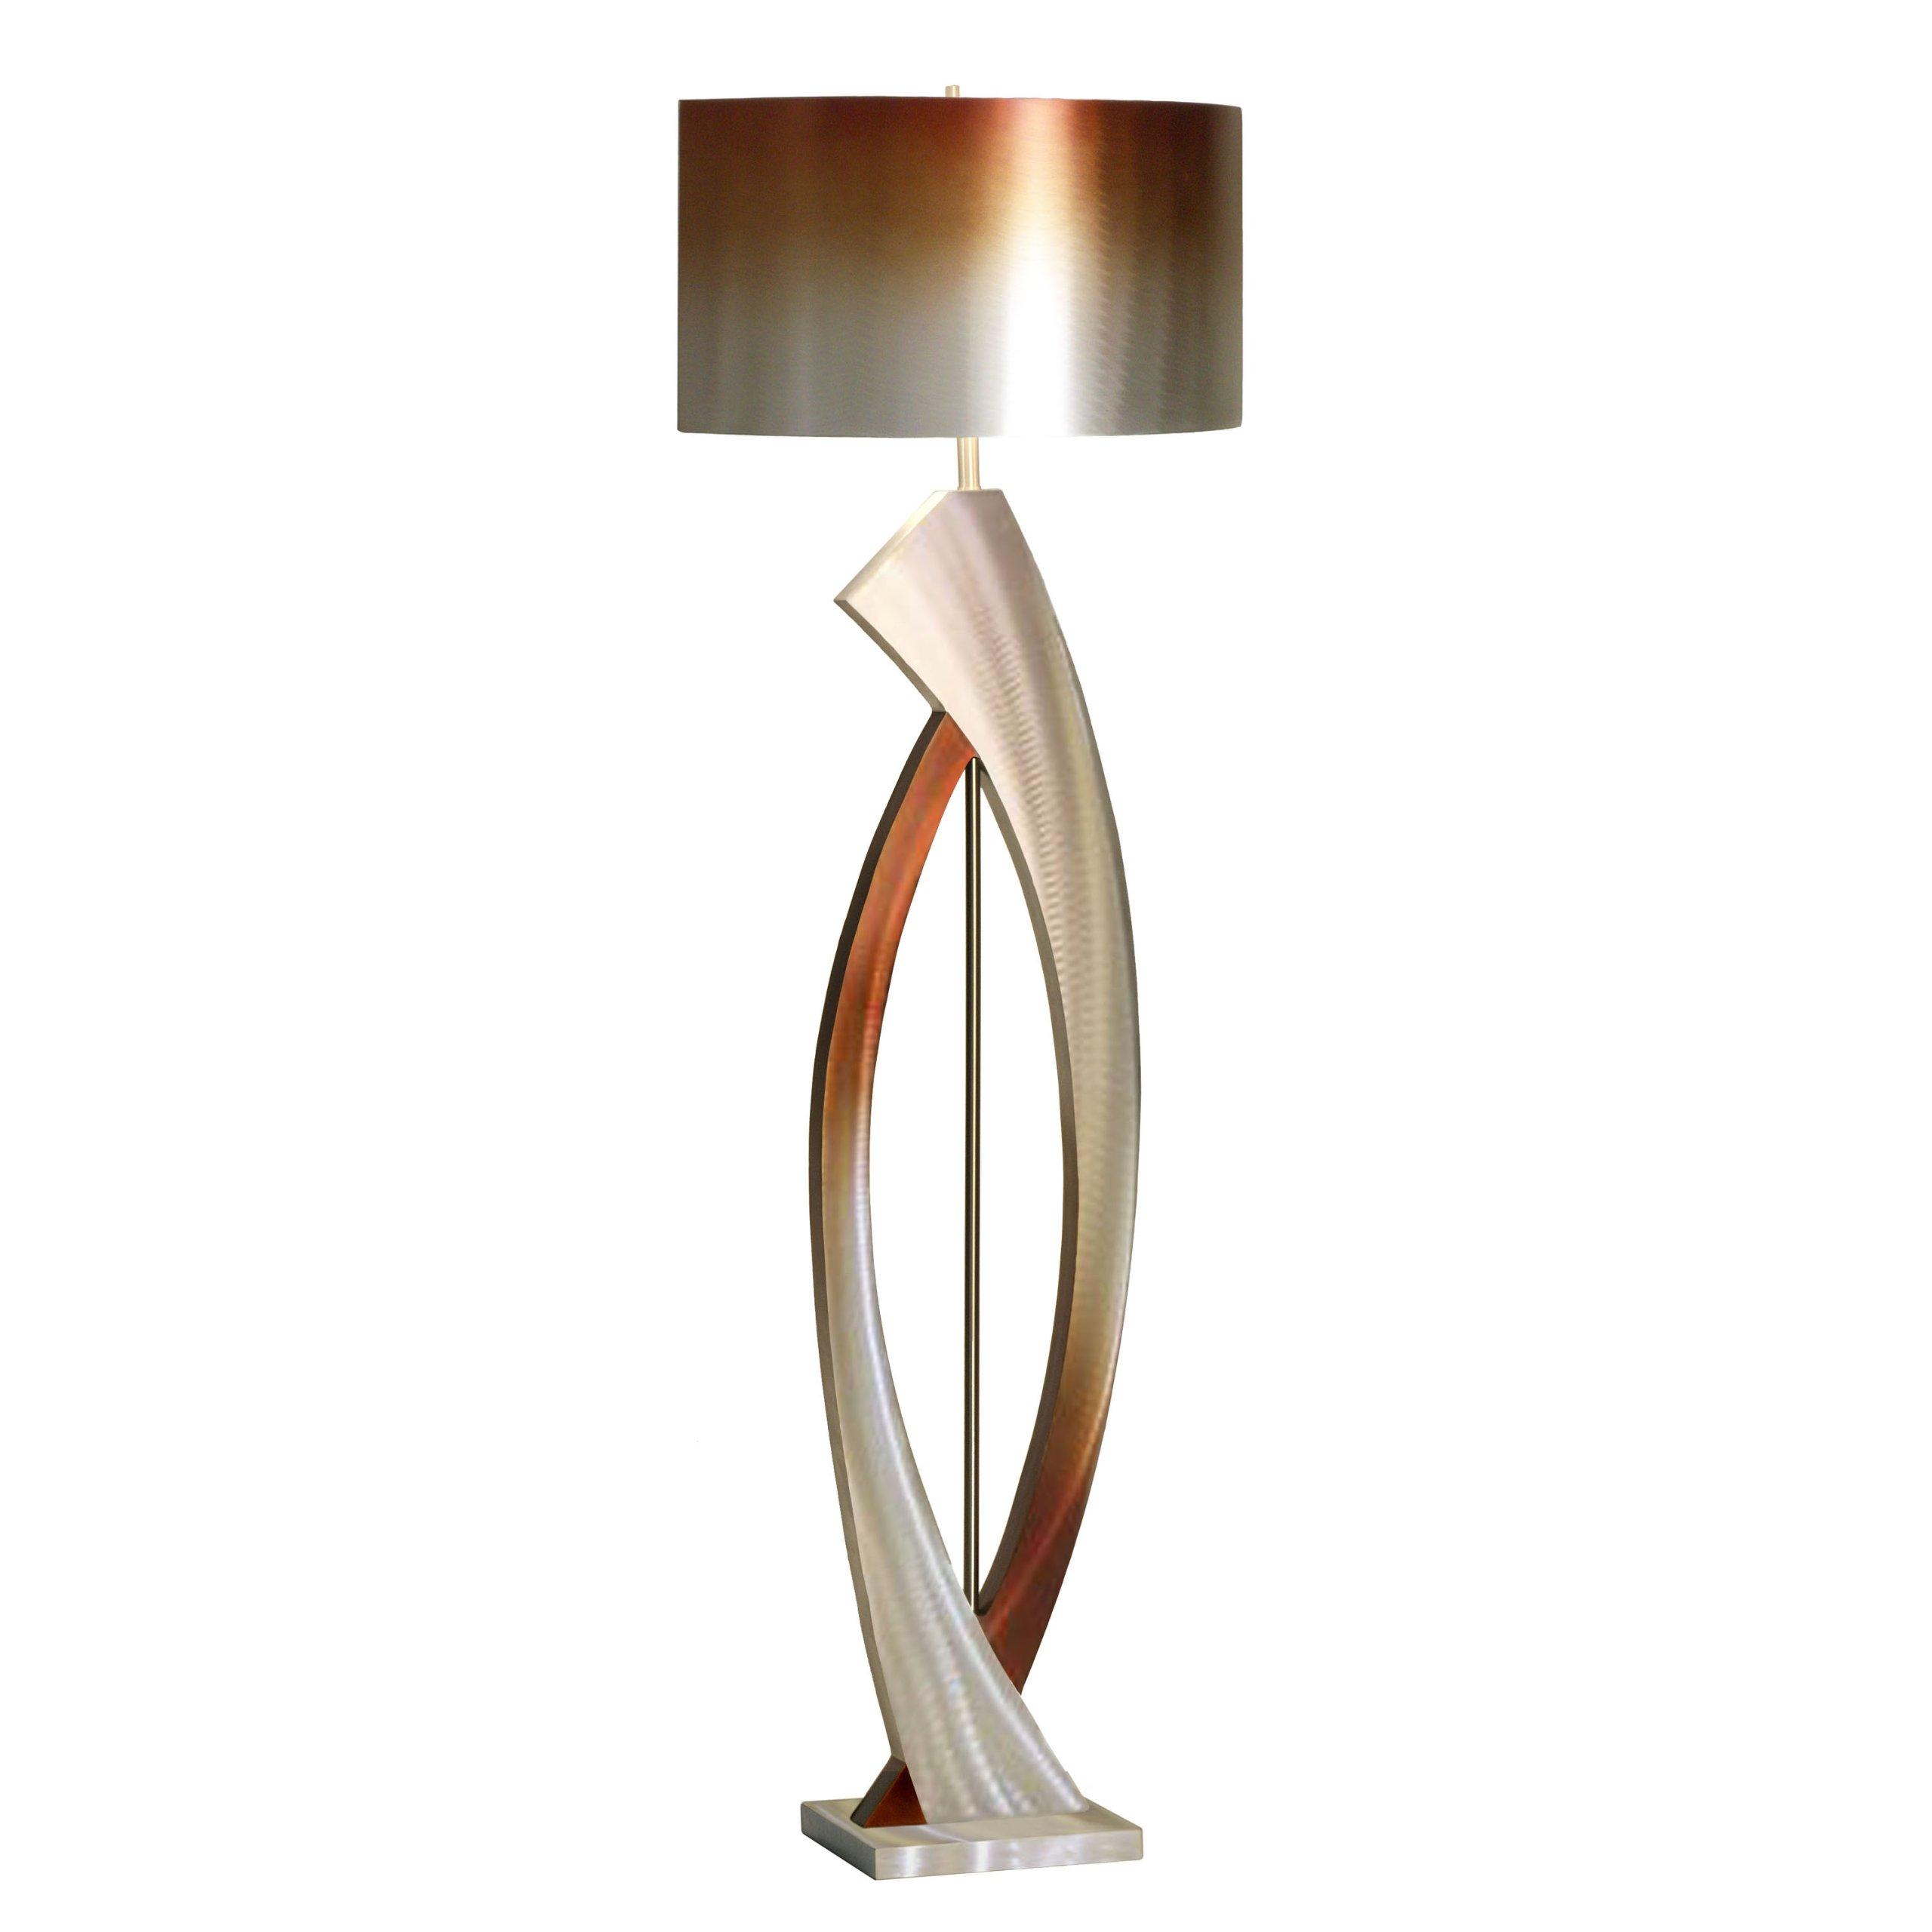 Nova Lighting JFL4810 Swerve Floor Lamp, Rust, Bronze, & Brushed Aluminum with Rust & Bronze Aluminum Shade